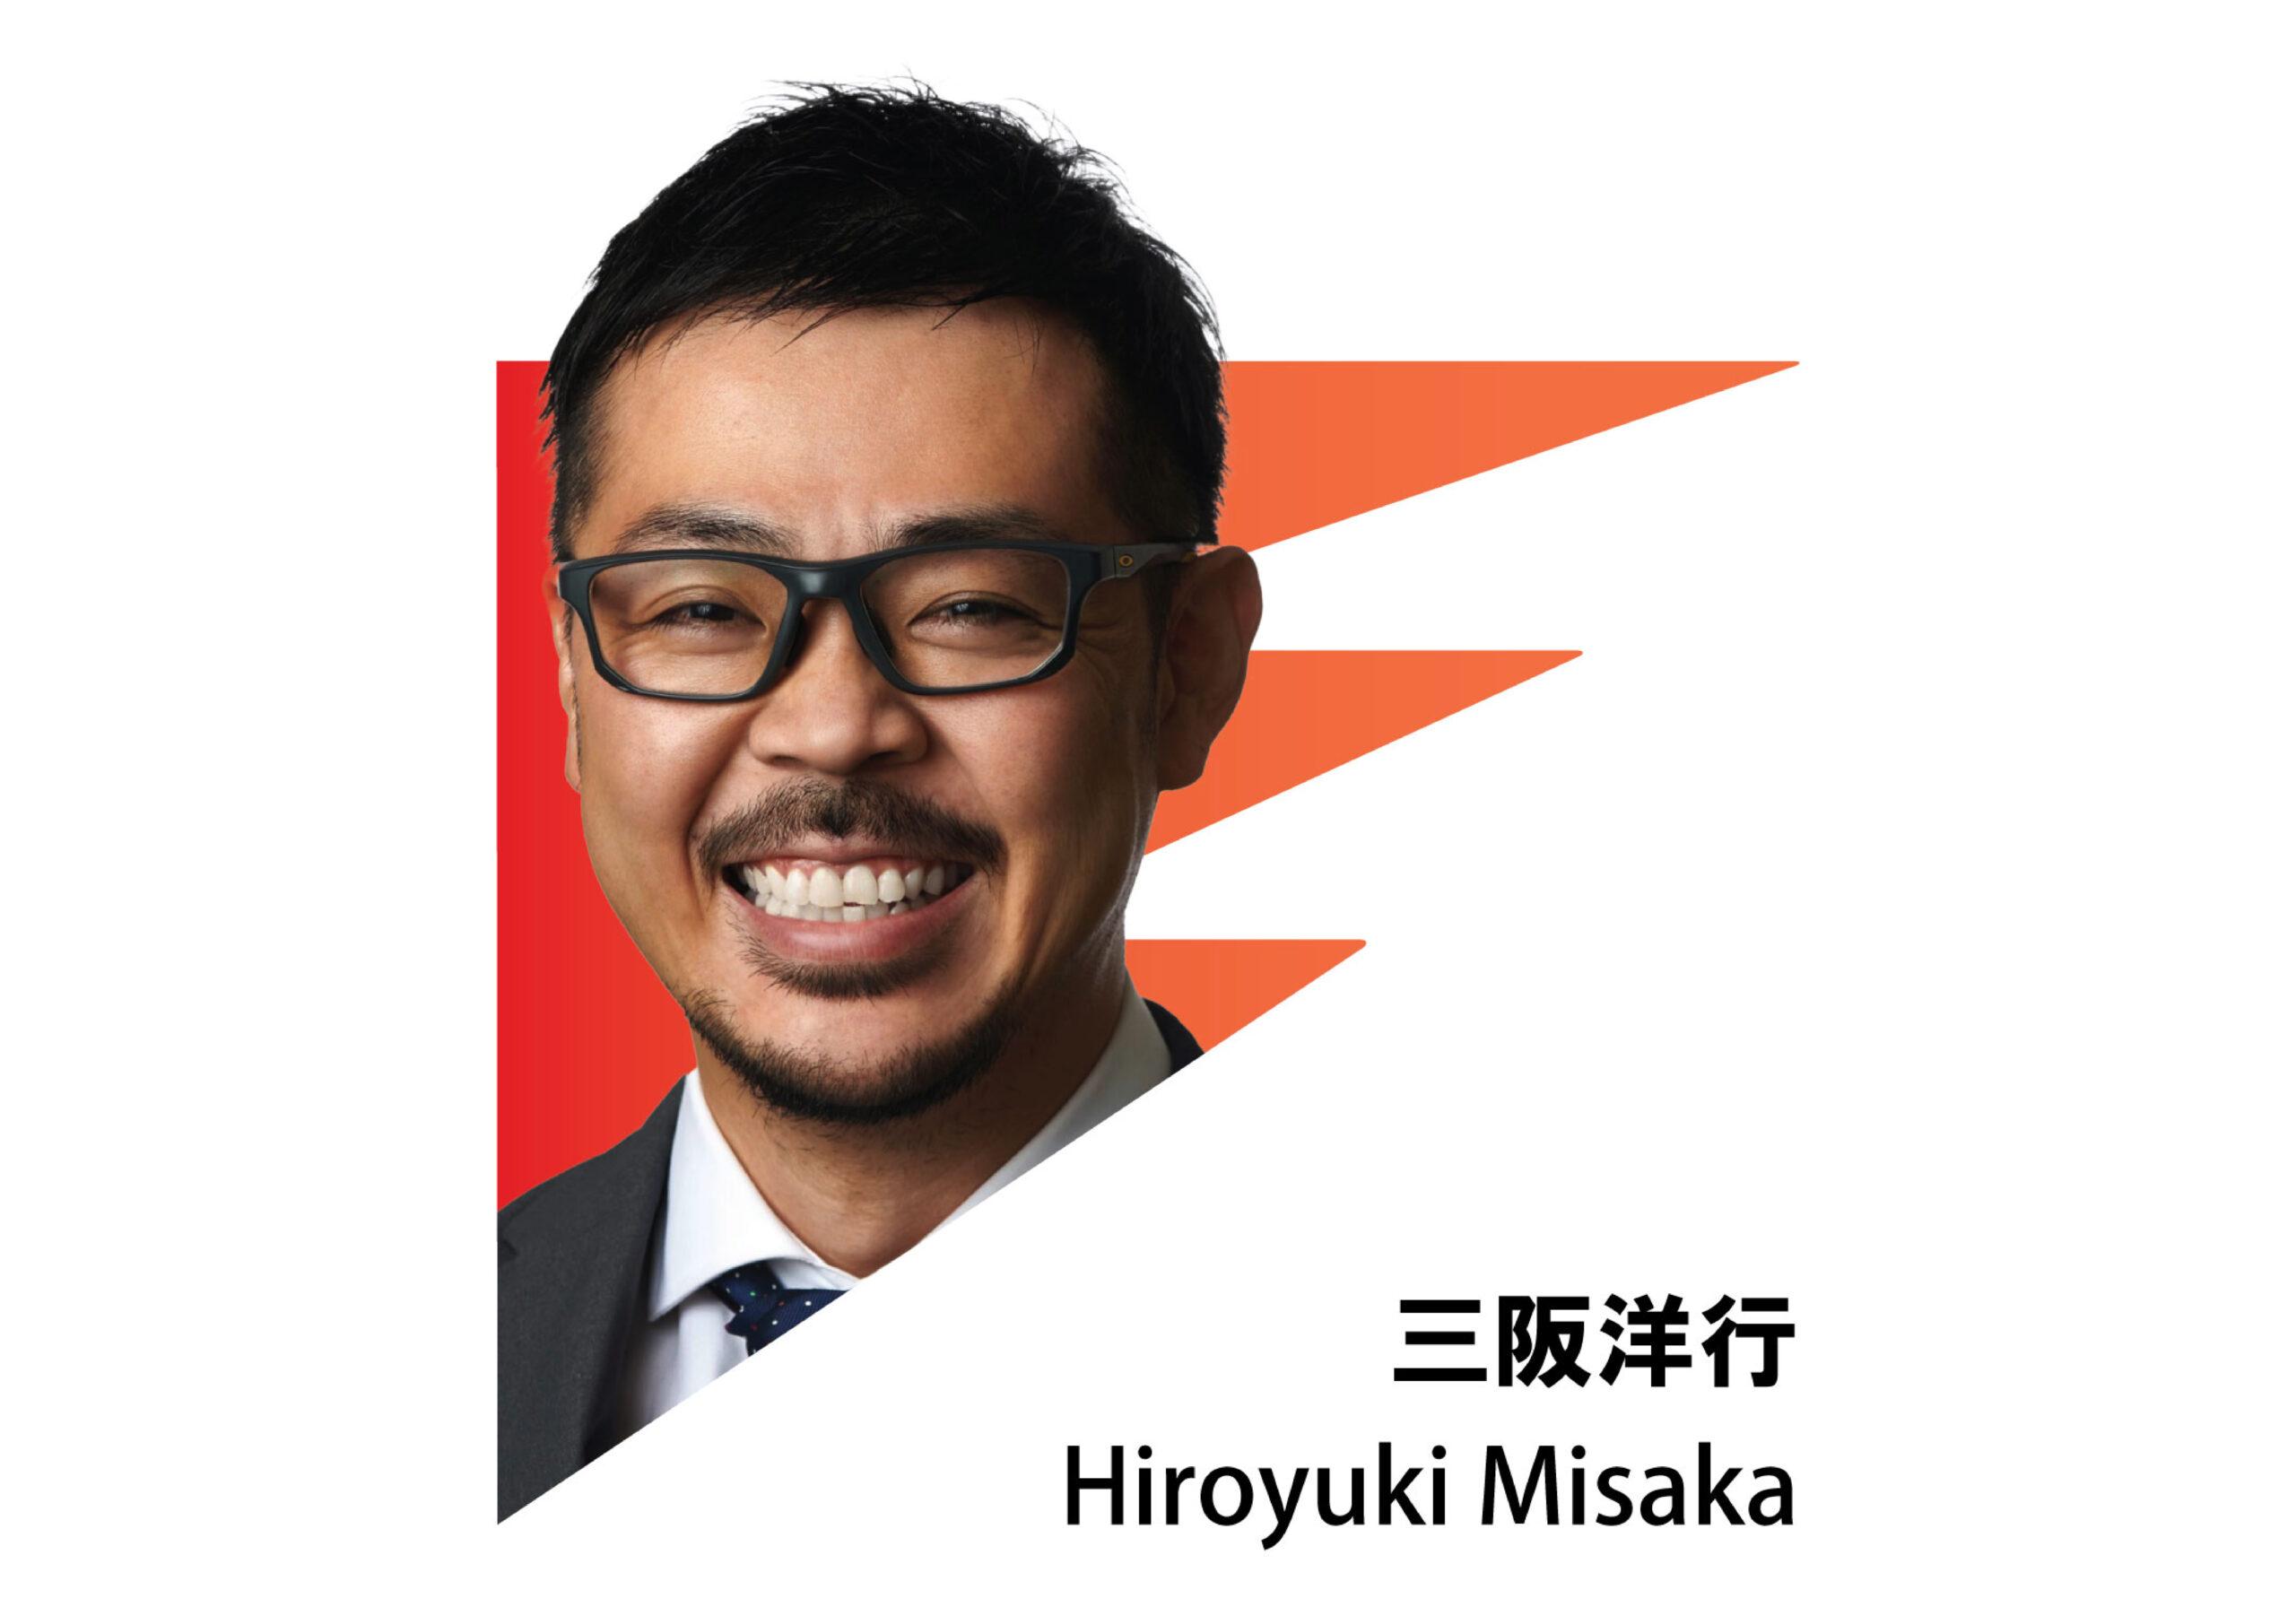 HIROYUKI MISAKA